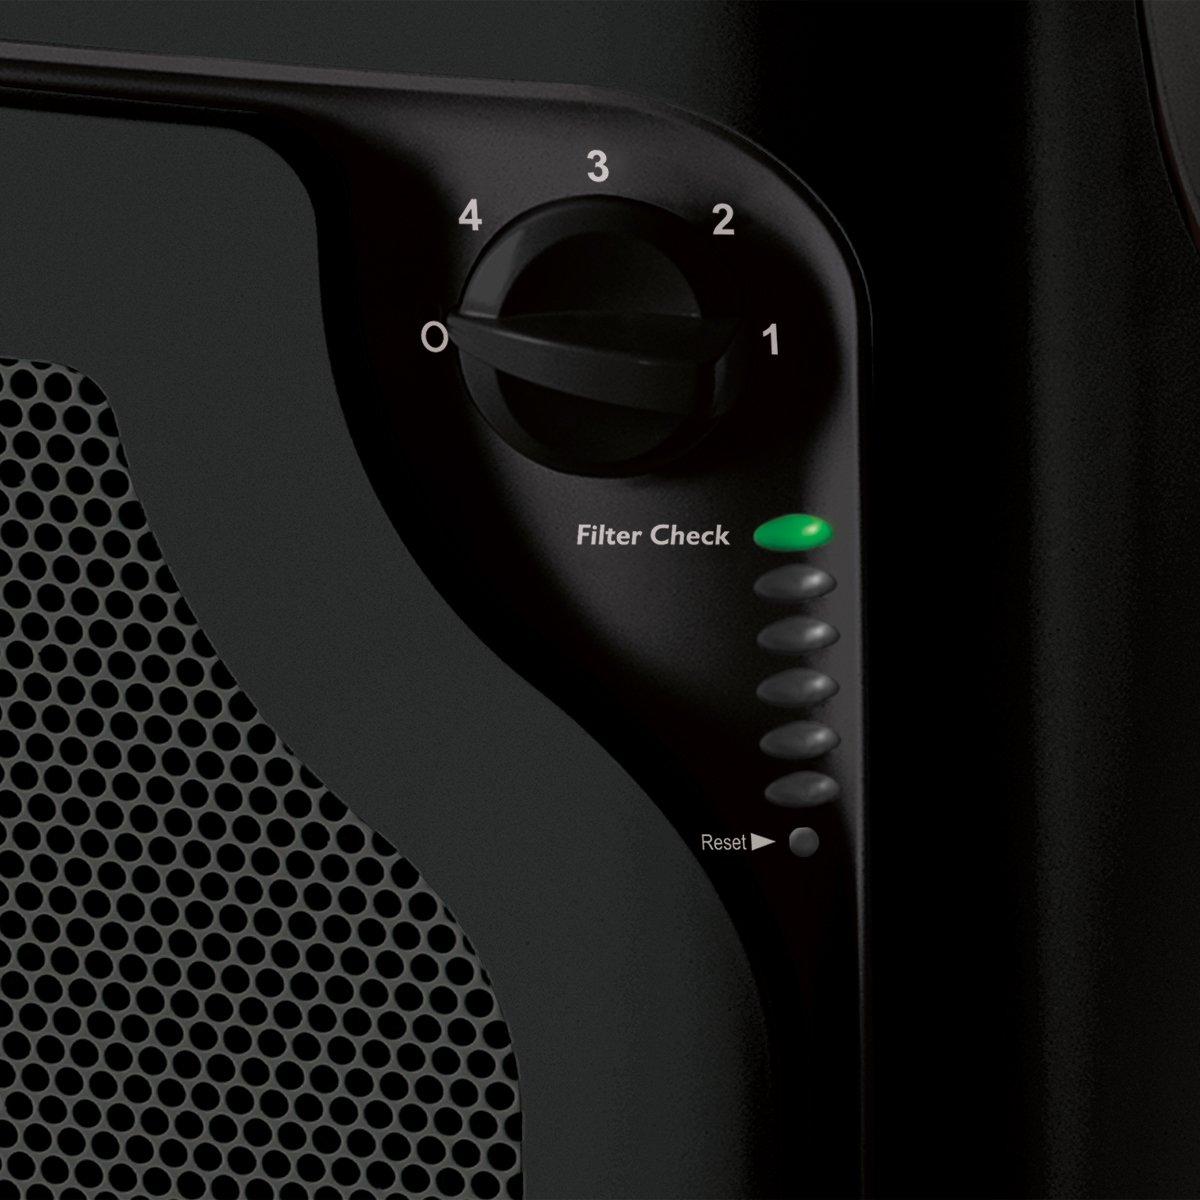 holmes hap8650b-nu review